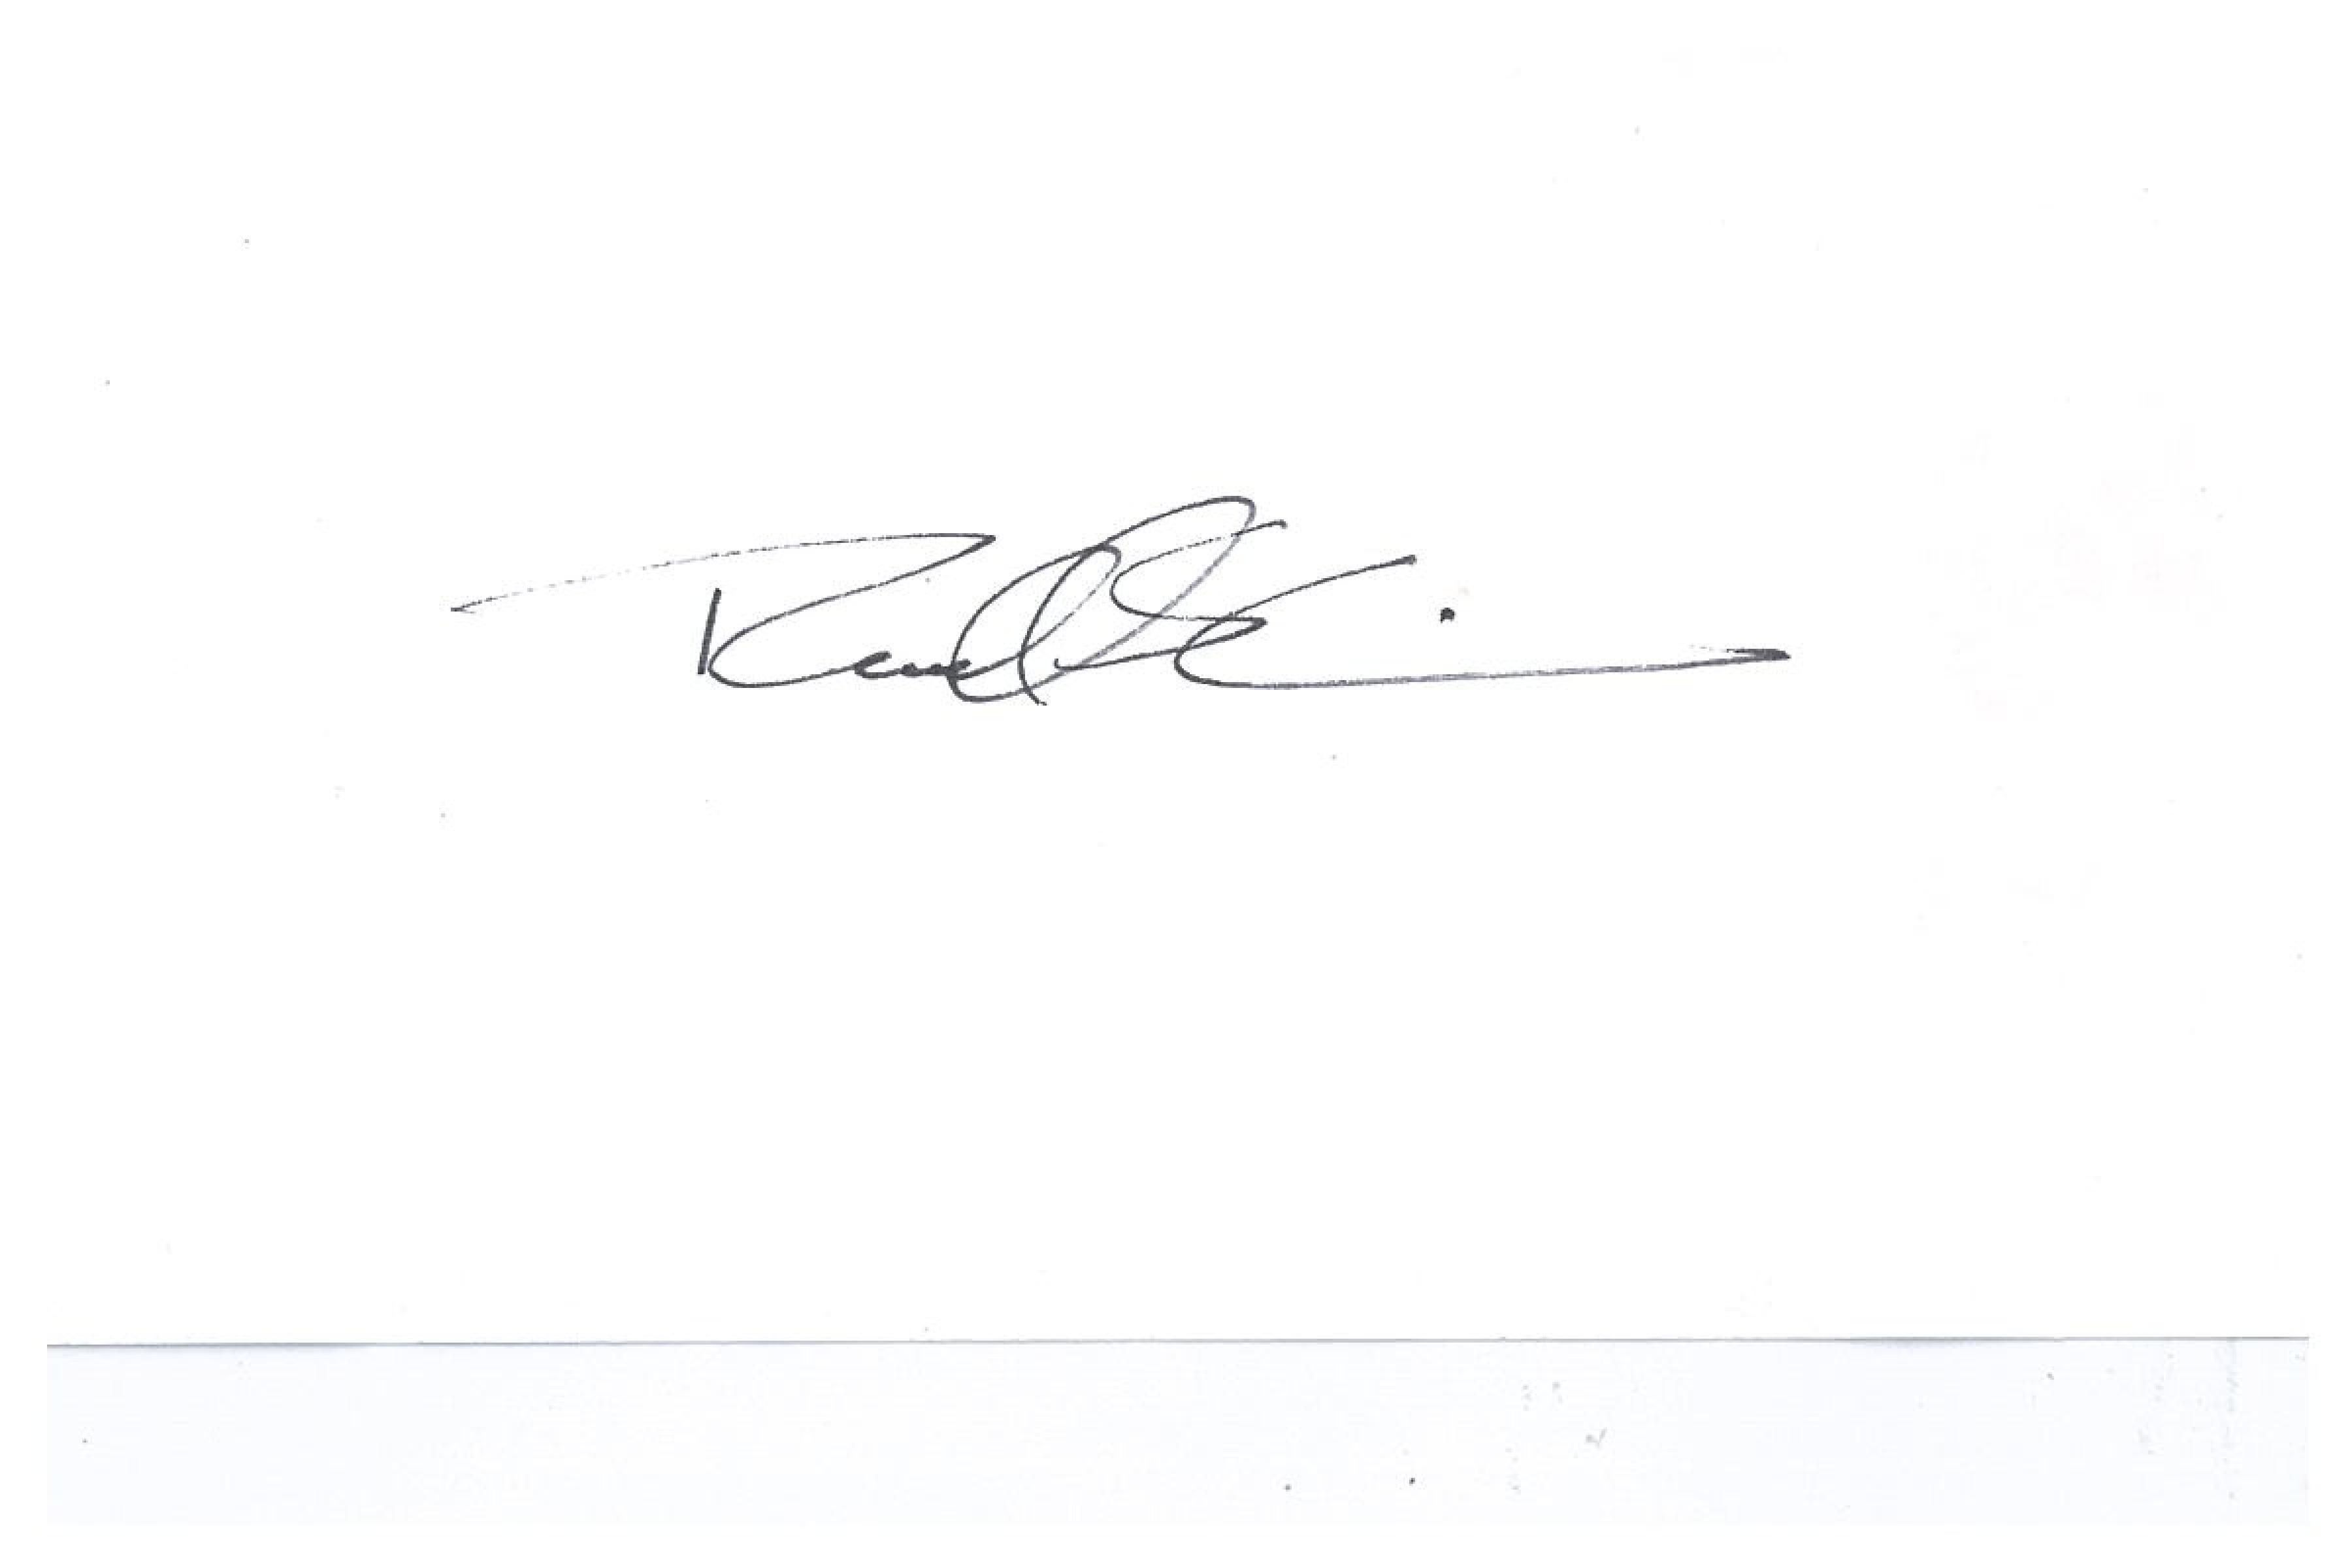 Russell Irwin's Signature